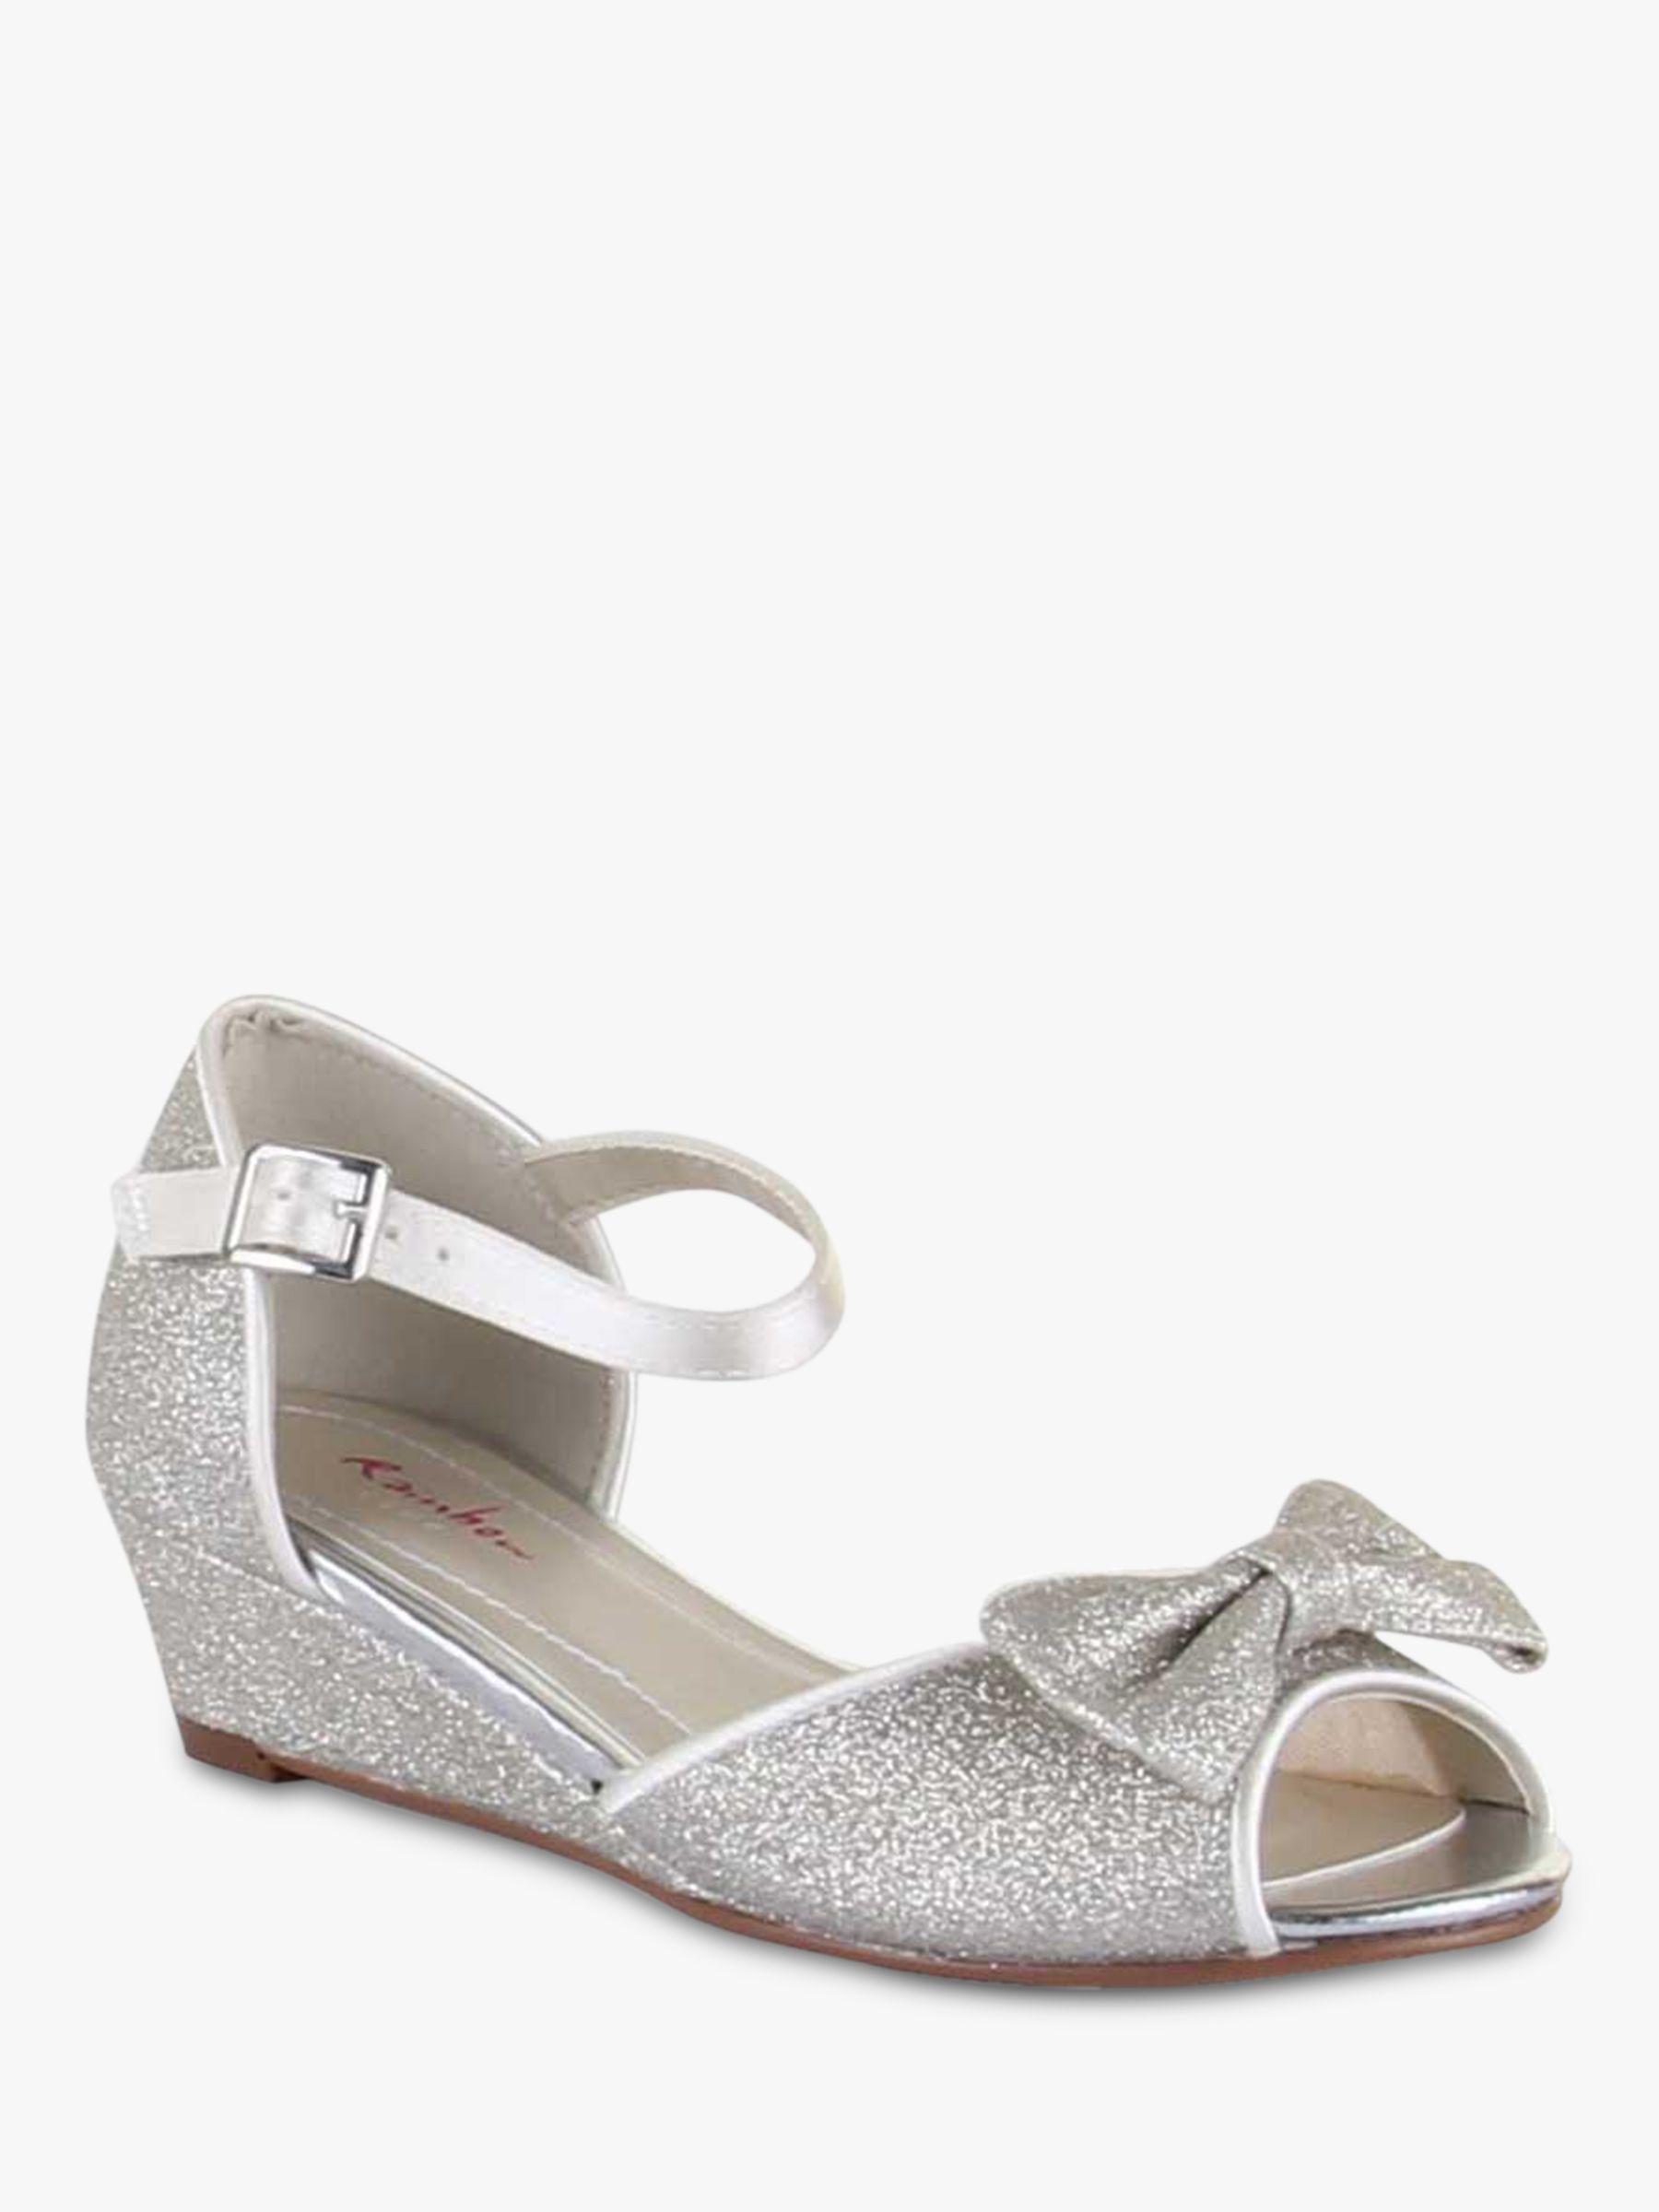 Rainbow Club Rainbow Club Kirsty Bridesmaids' Shoes, Silver Shimmer